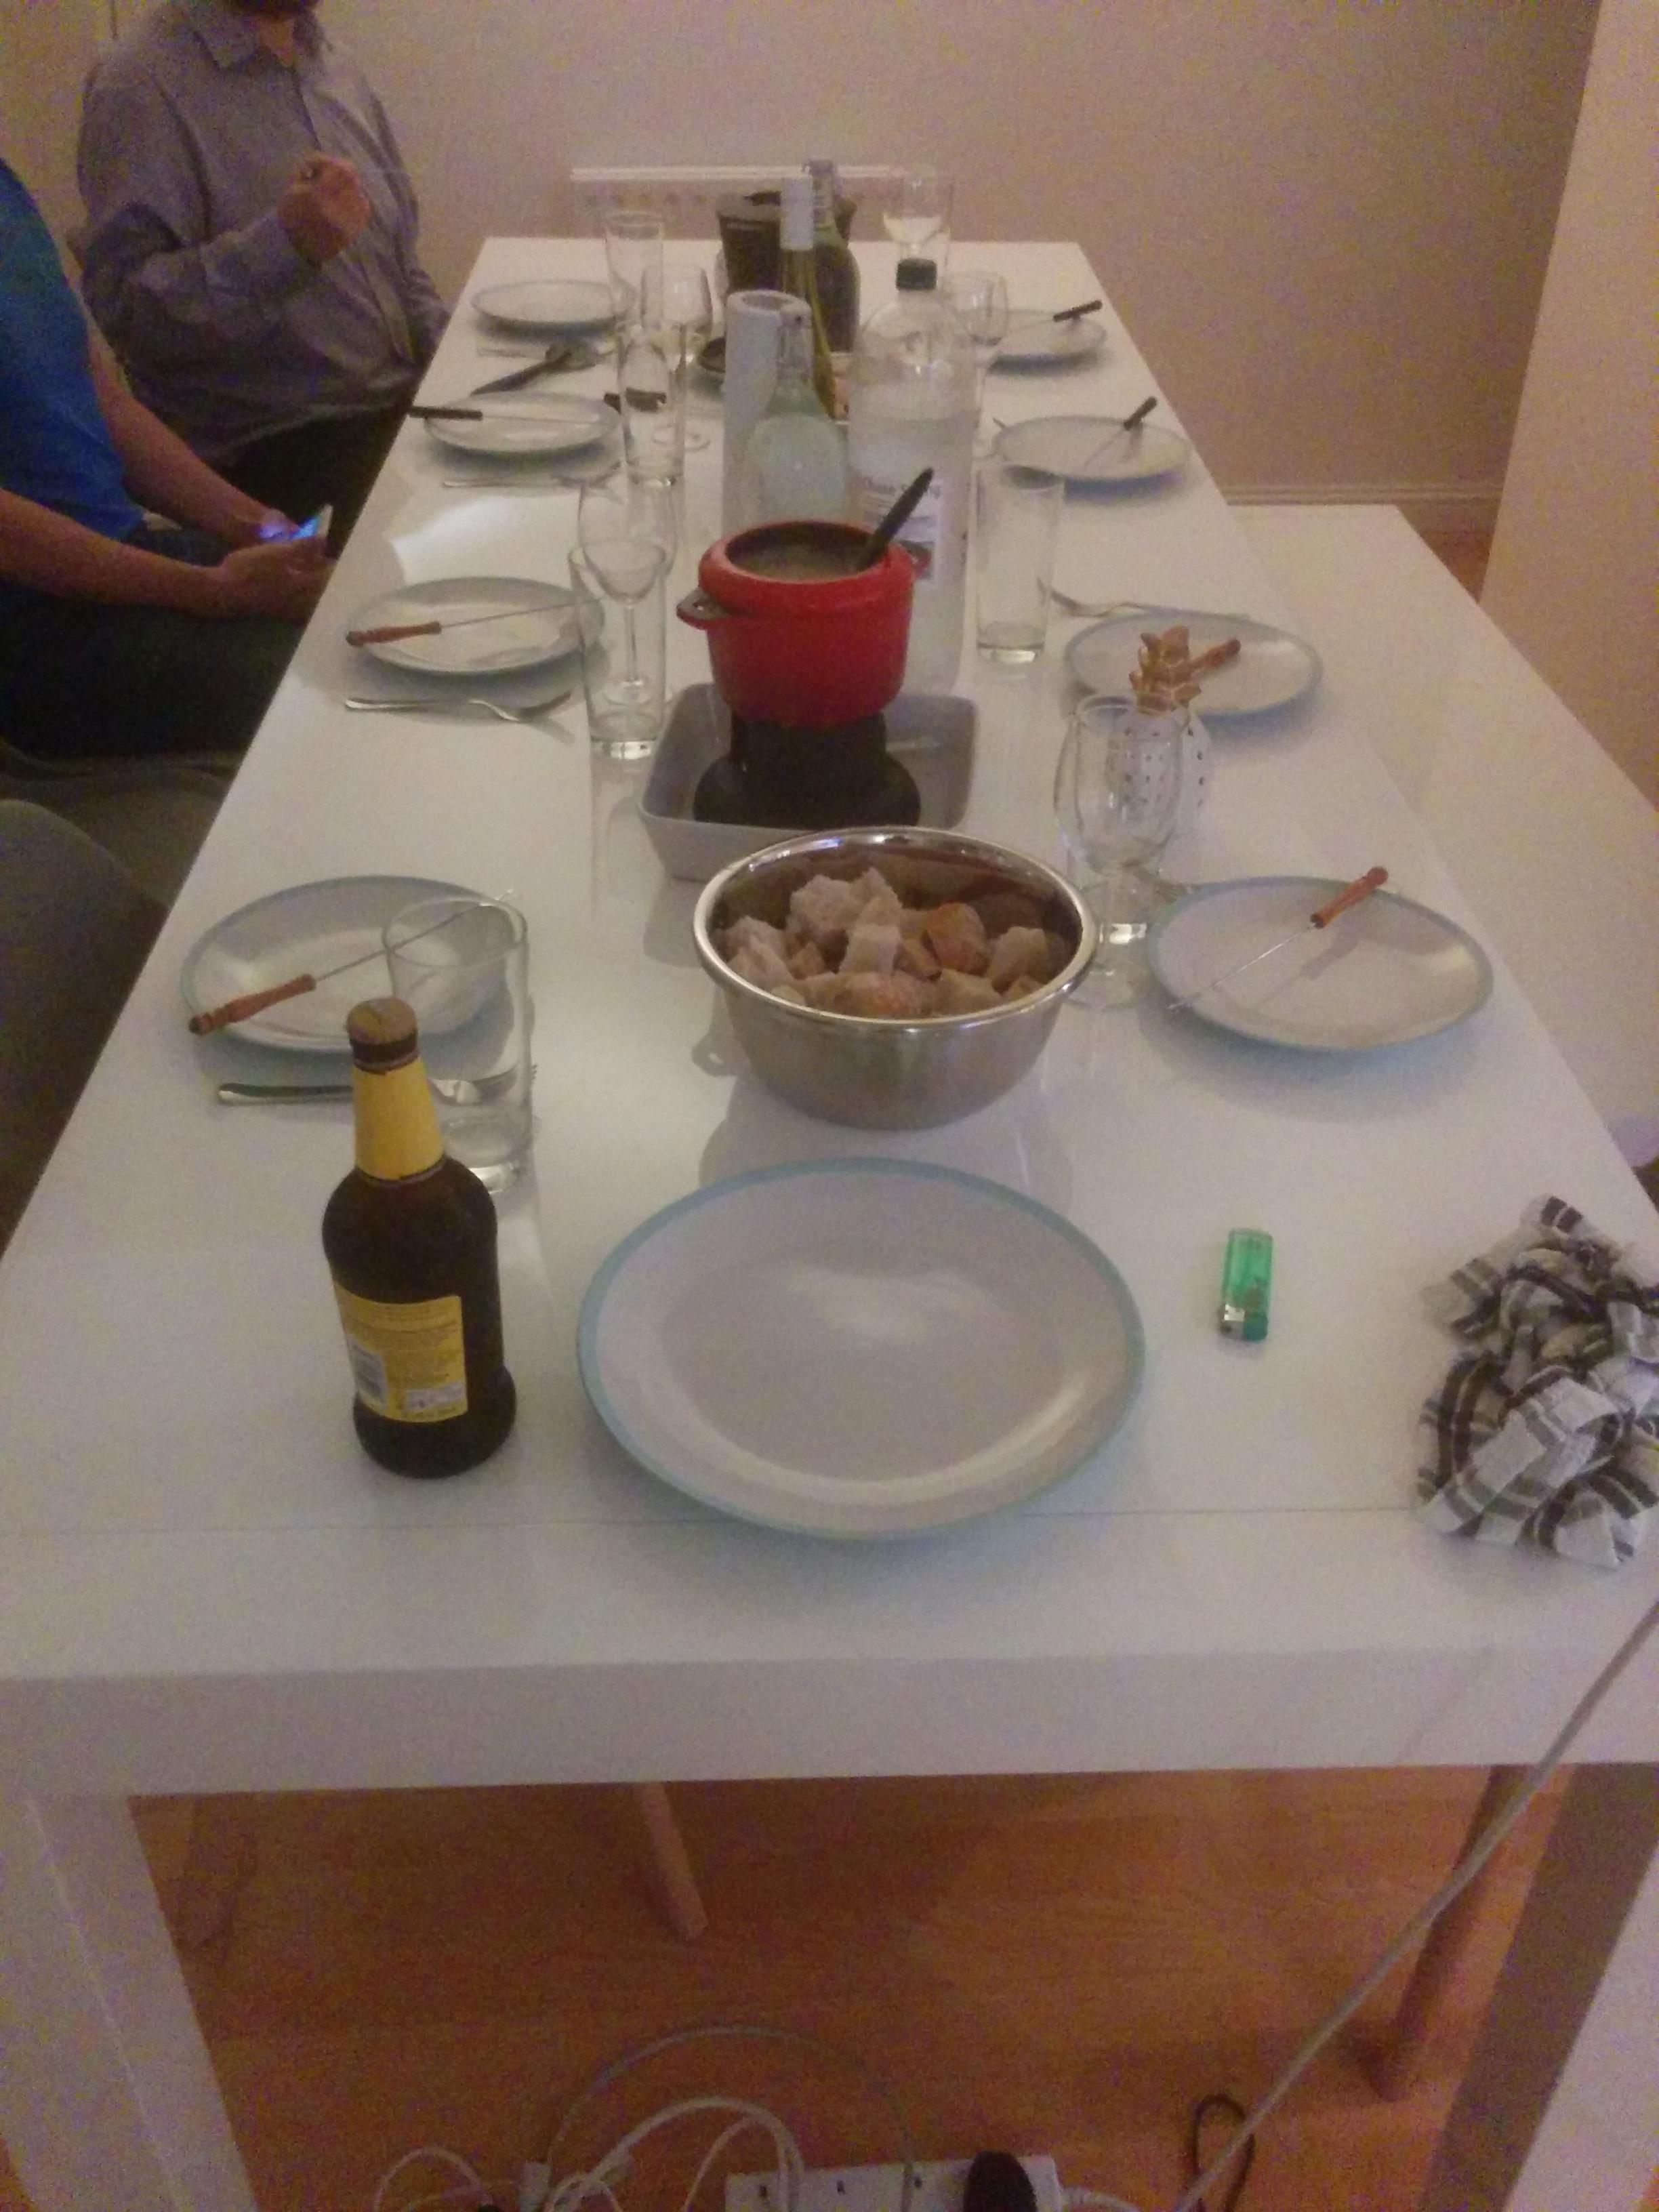 Our fondue dinner